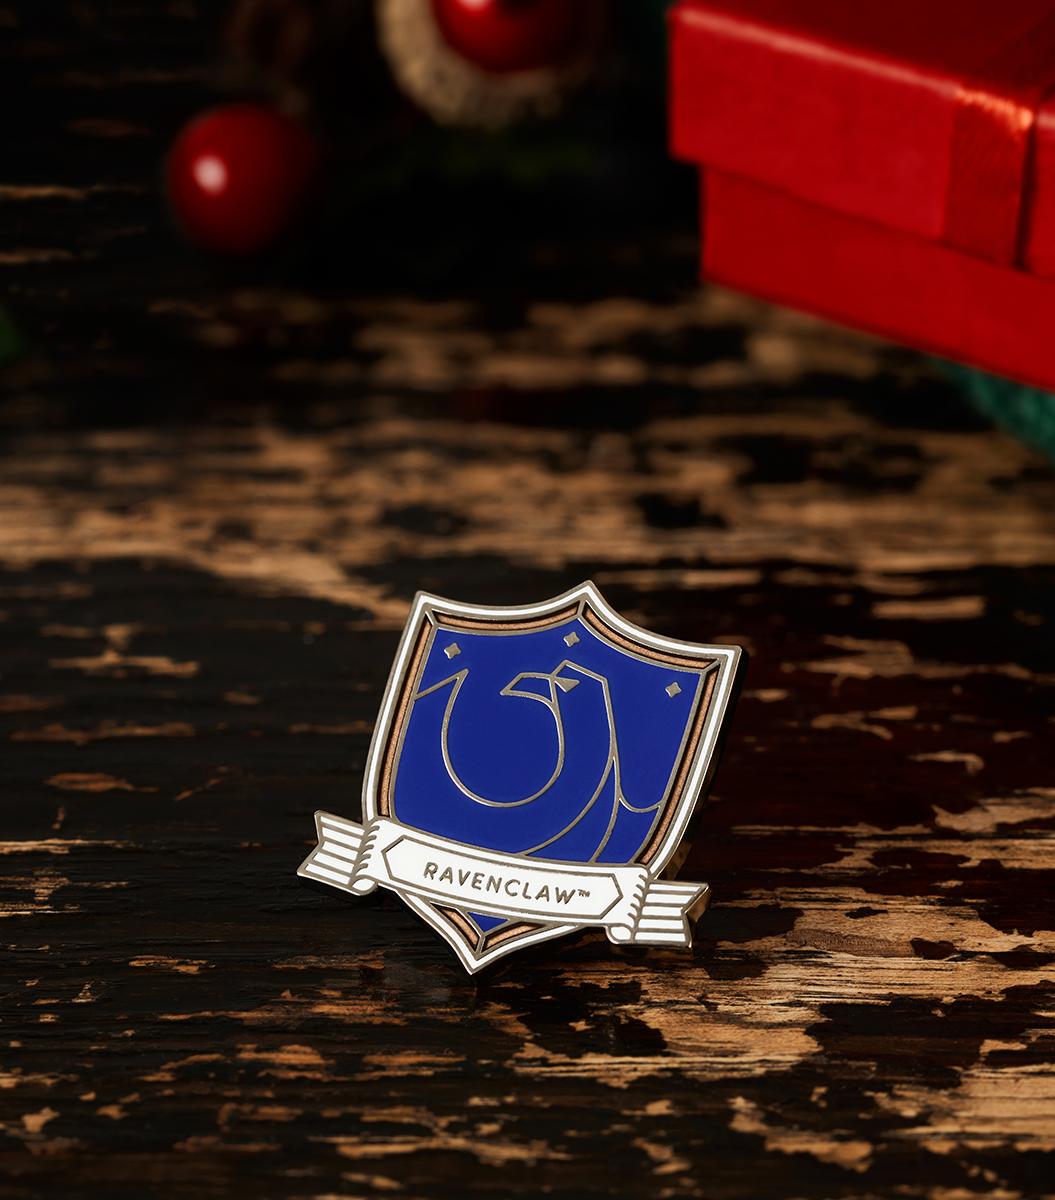 Ravenclaw™ House Crest Enamel Pin